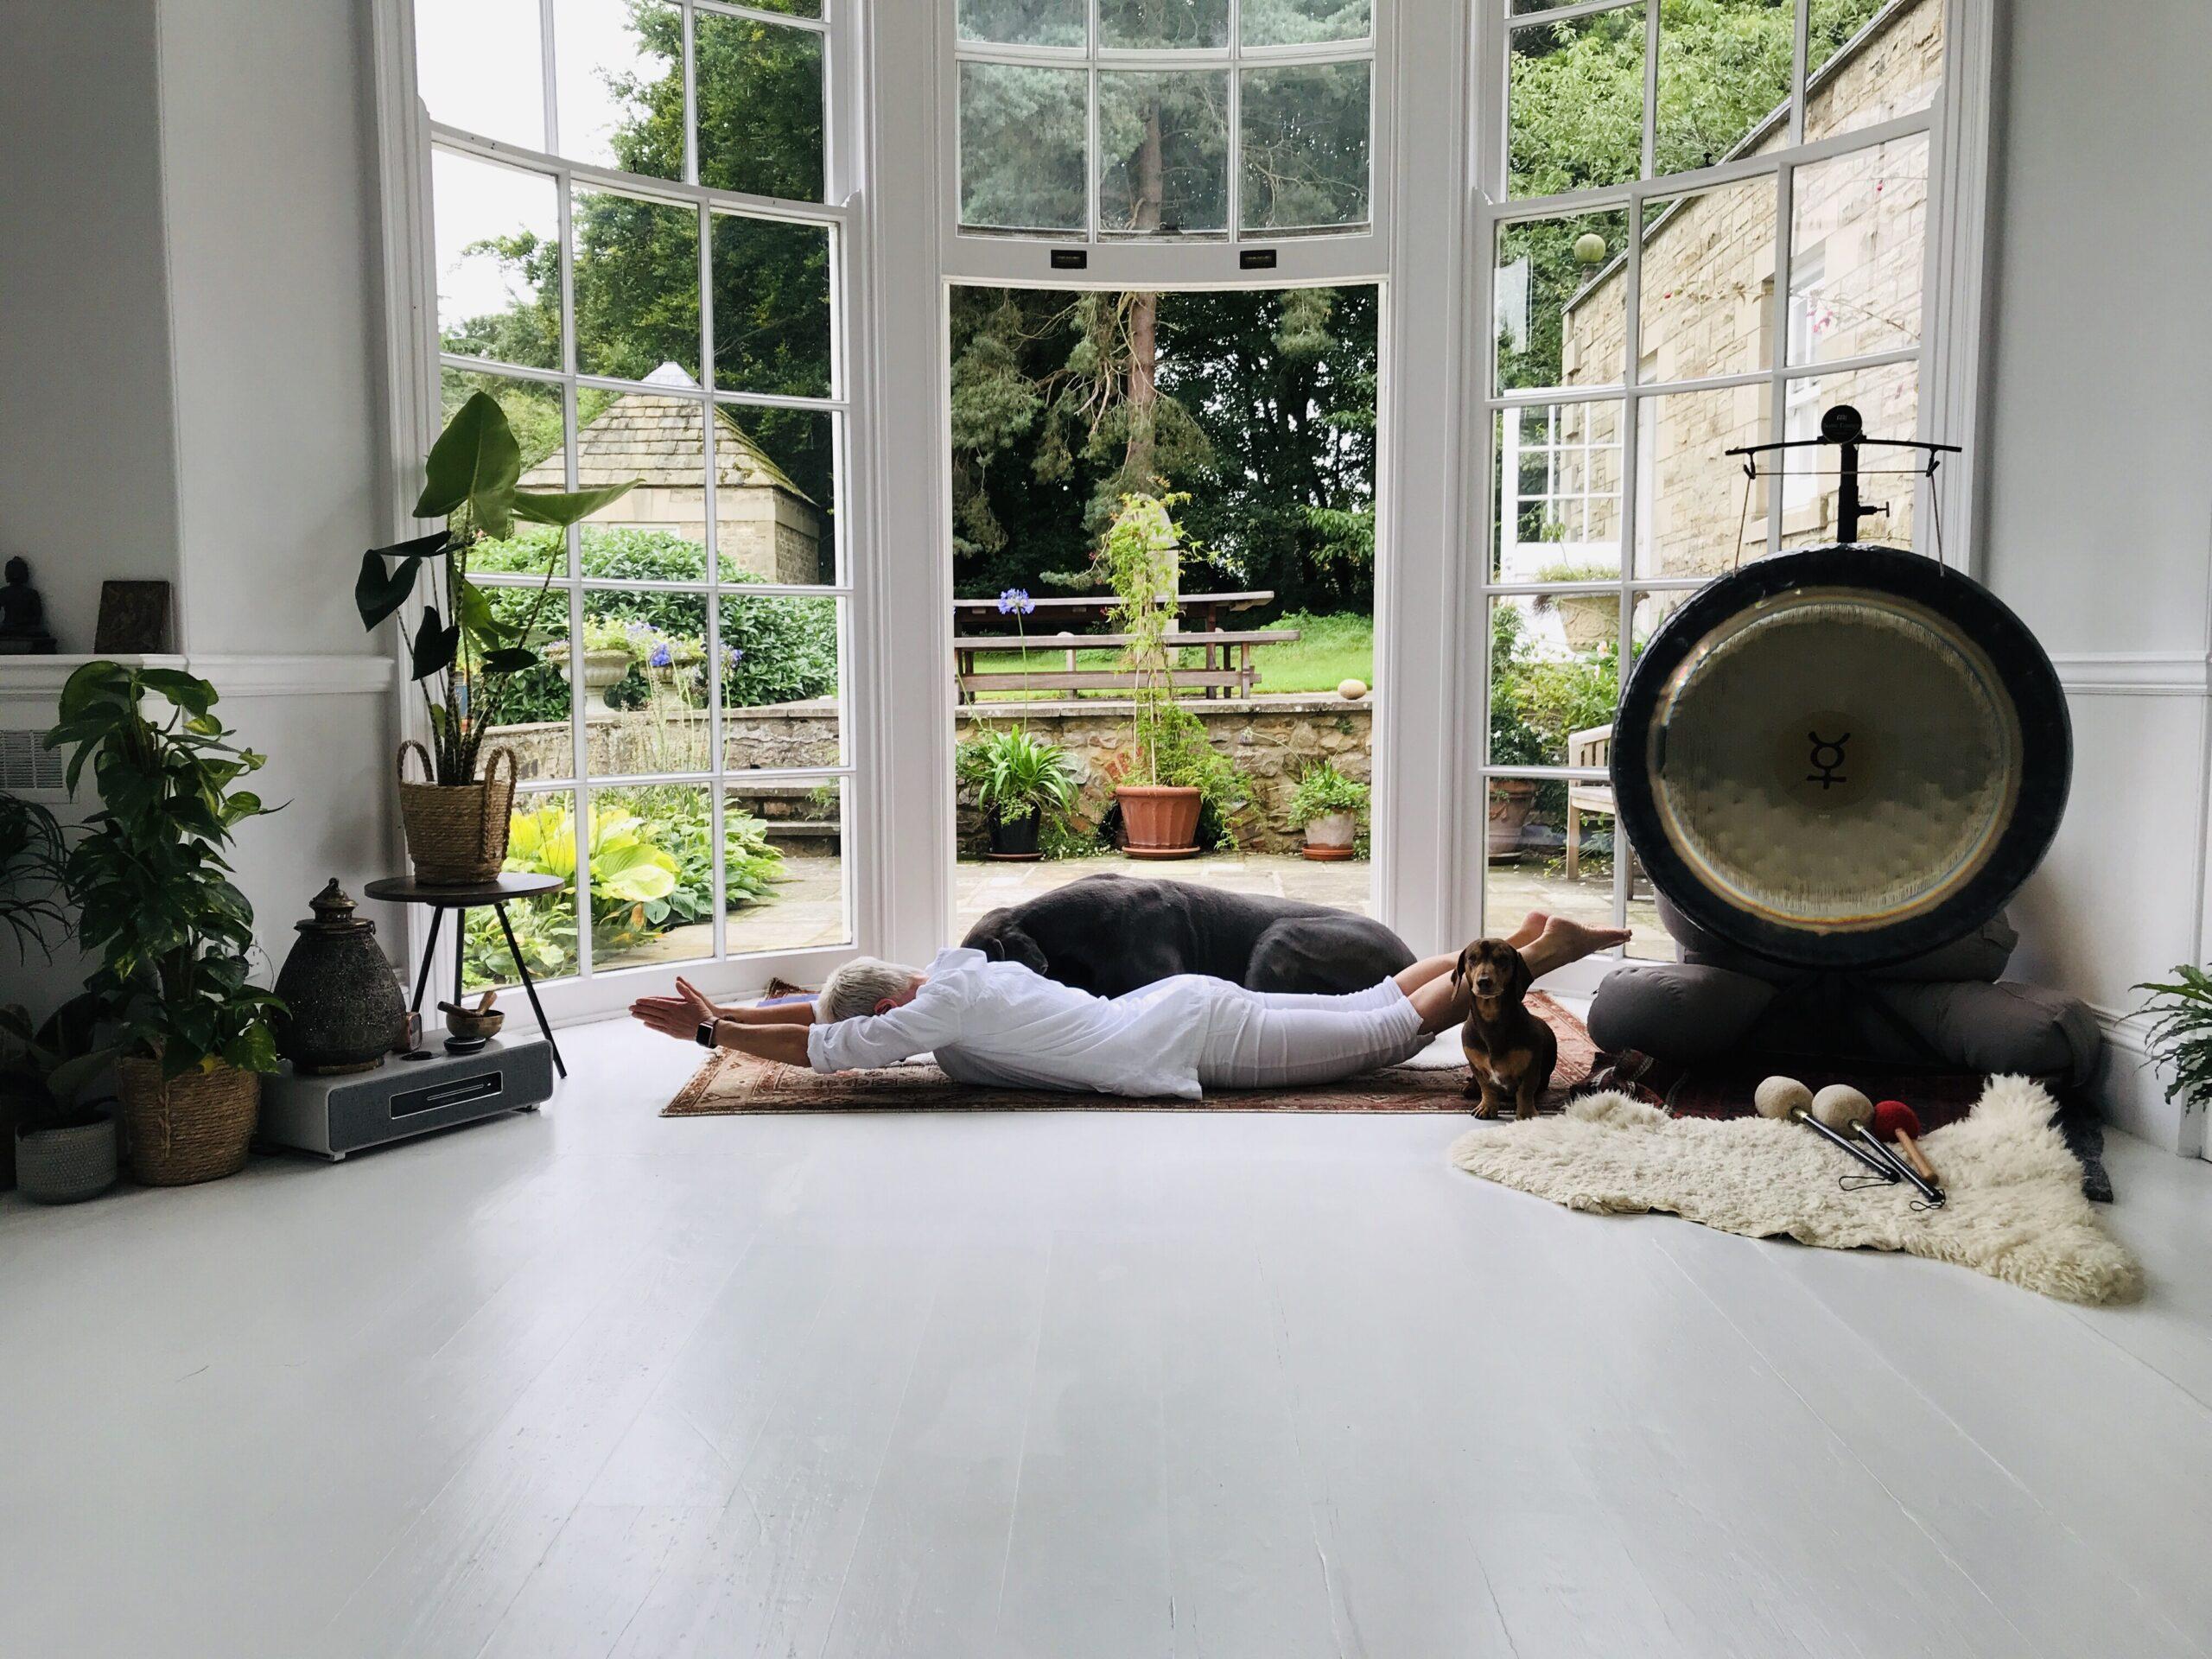 Kundalini yoga Warrior Class at YogaSpace Yorkshire